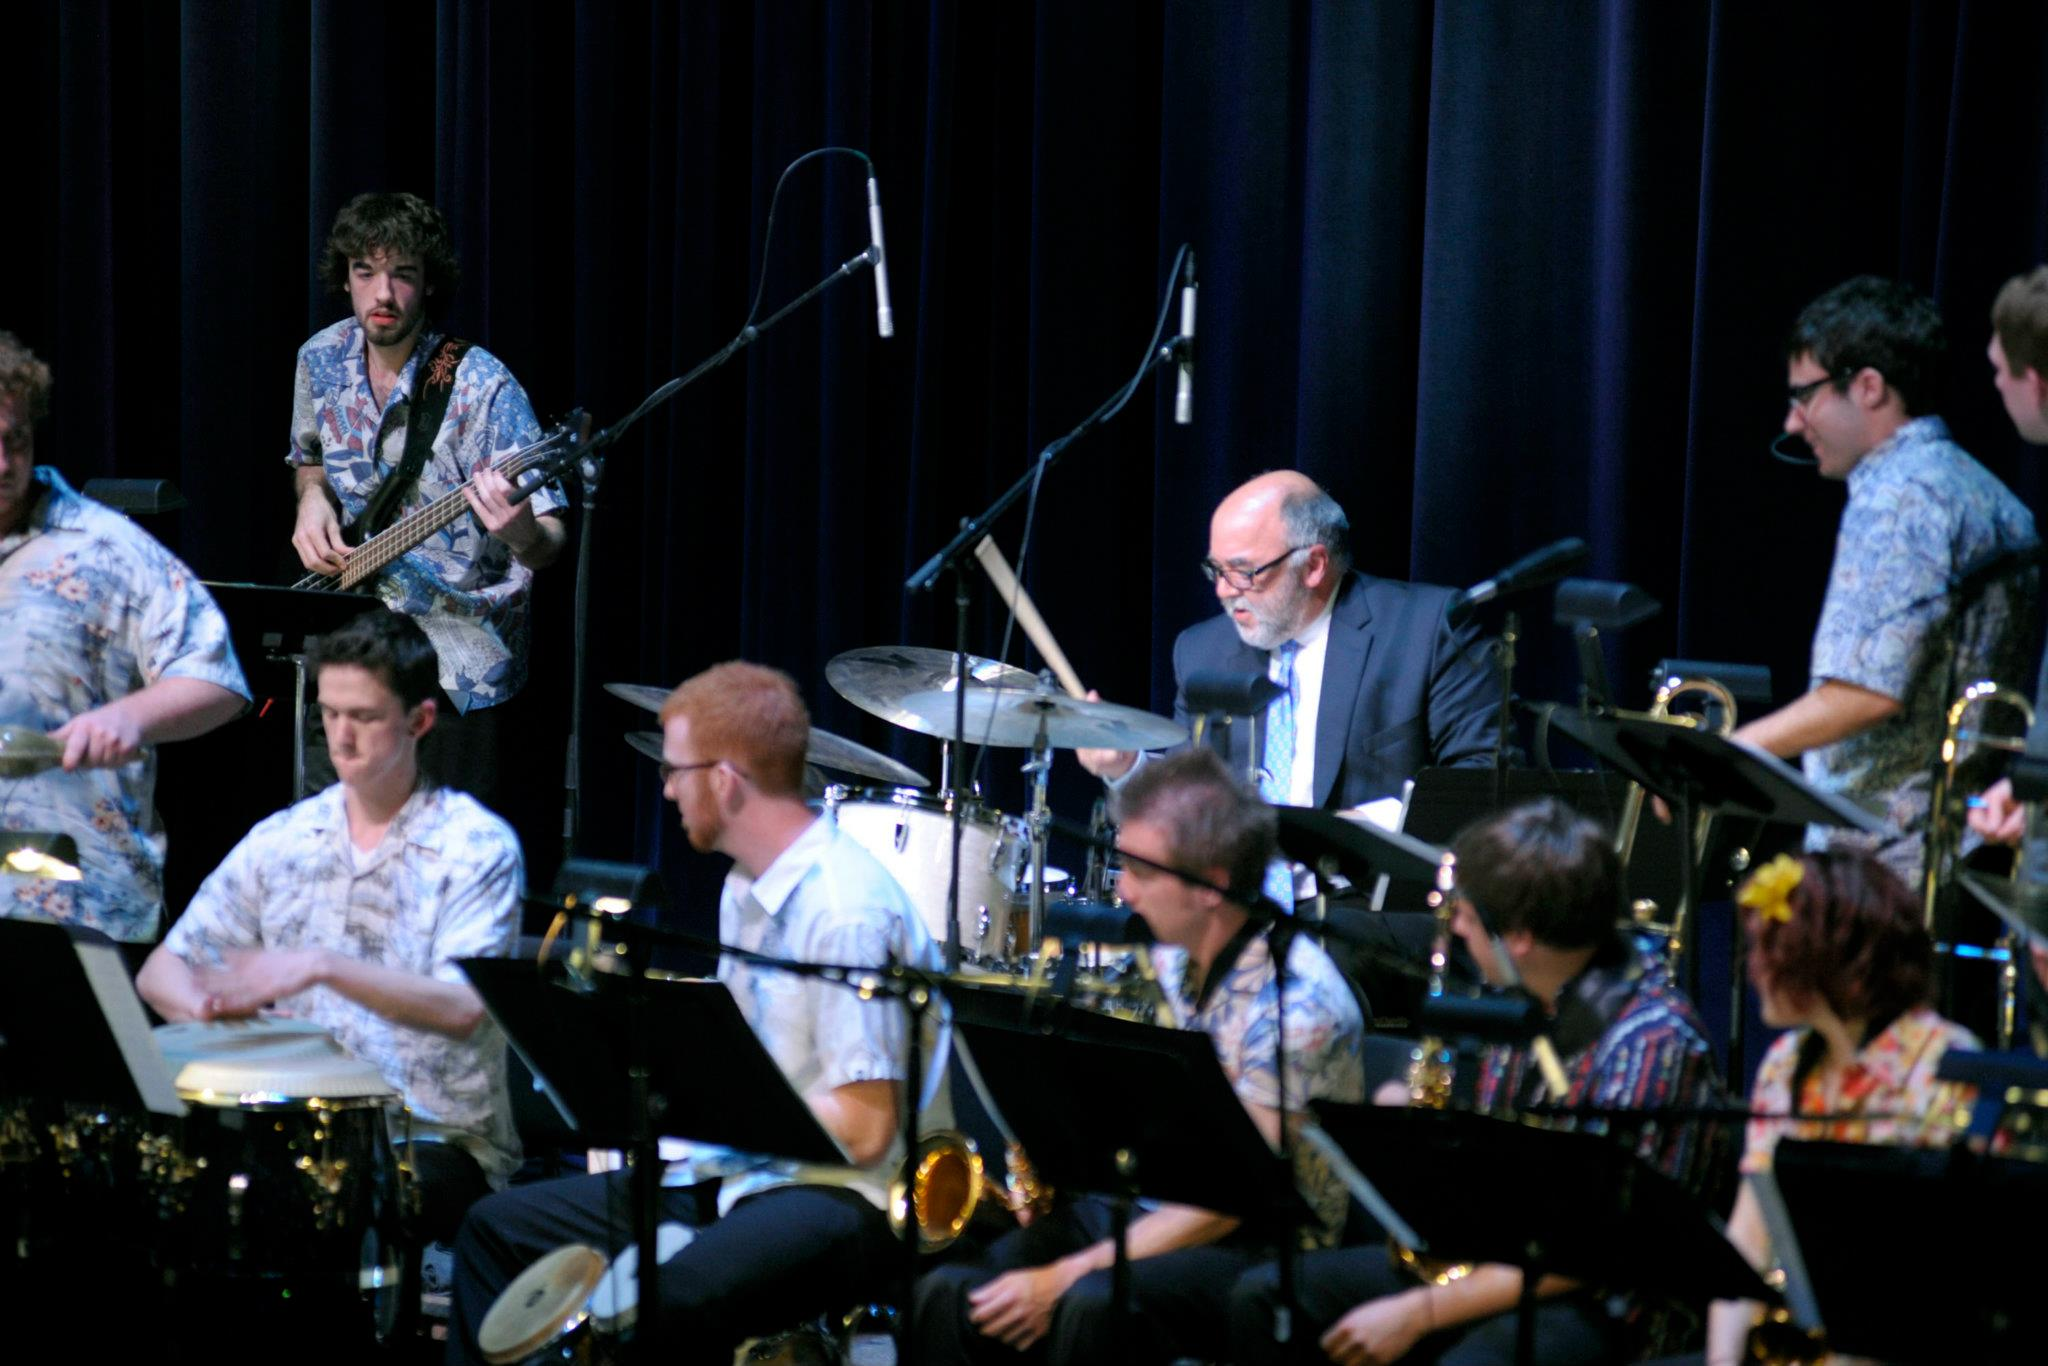 Sean performing with Peter Erskine